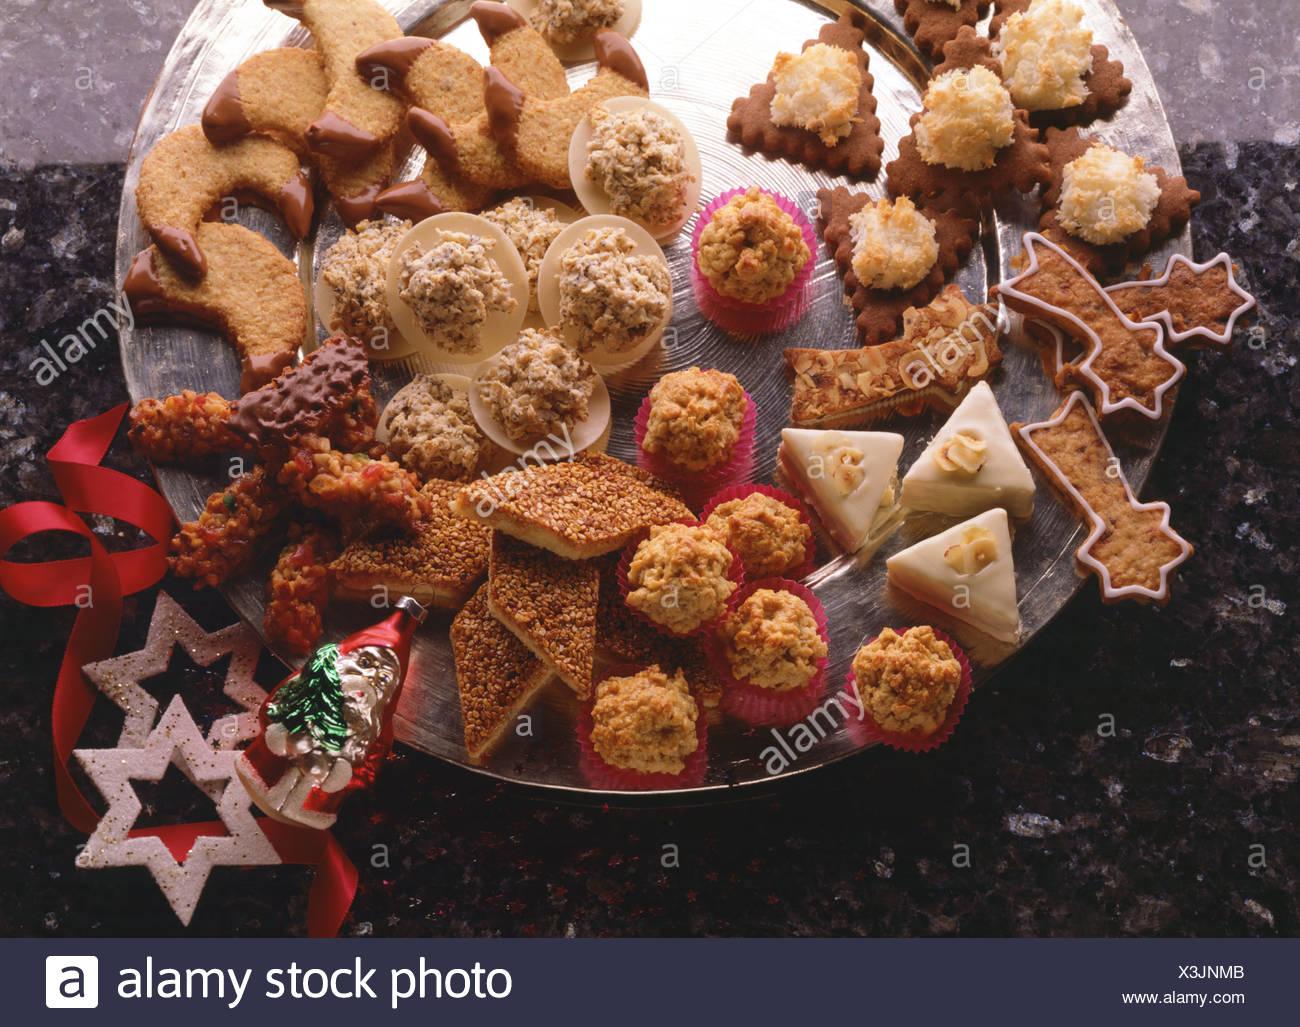 Tableau Christmas Cookies Several Kinds Of German Christmas